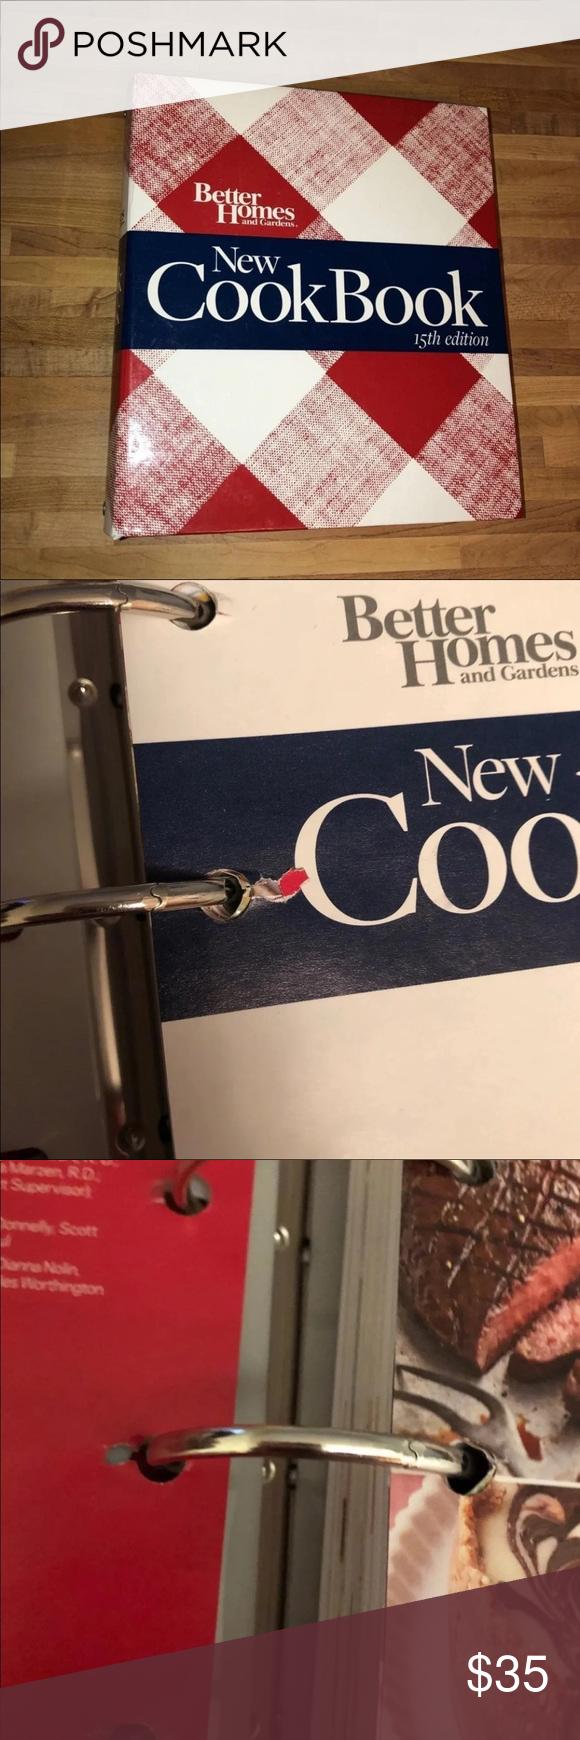 9e4c5a30179cf07599689ea40e2ead93 - Better Homes And Gardens New Cookbook 15th Edition